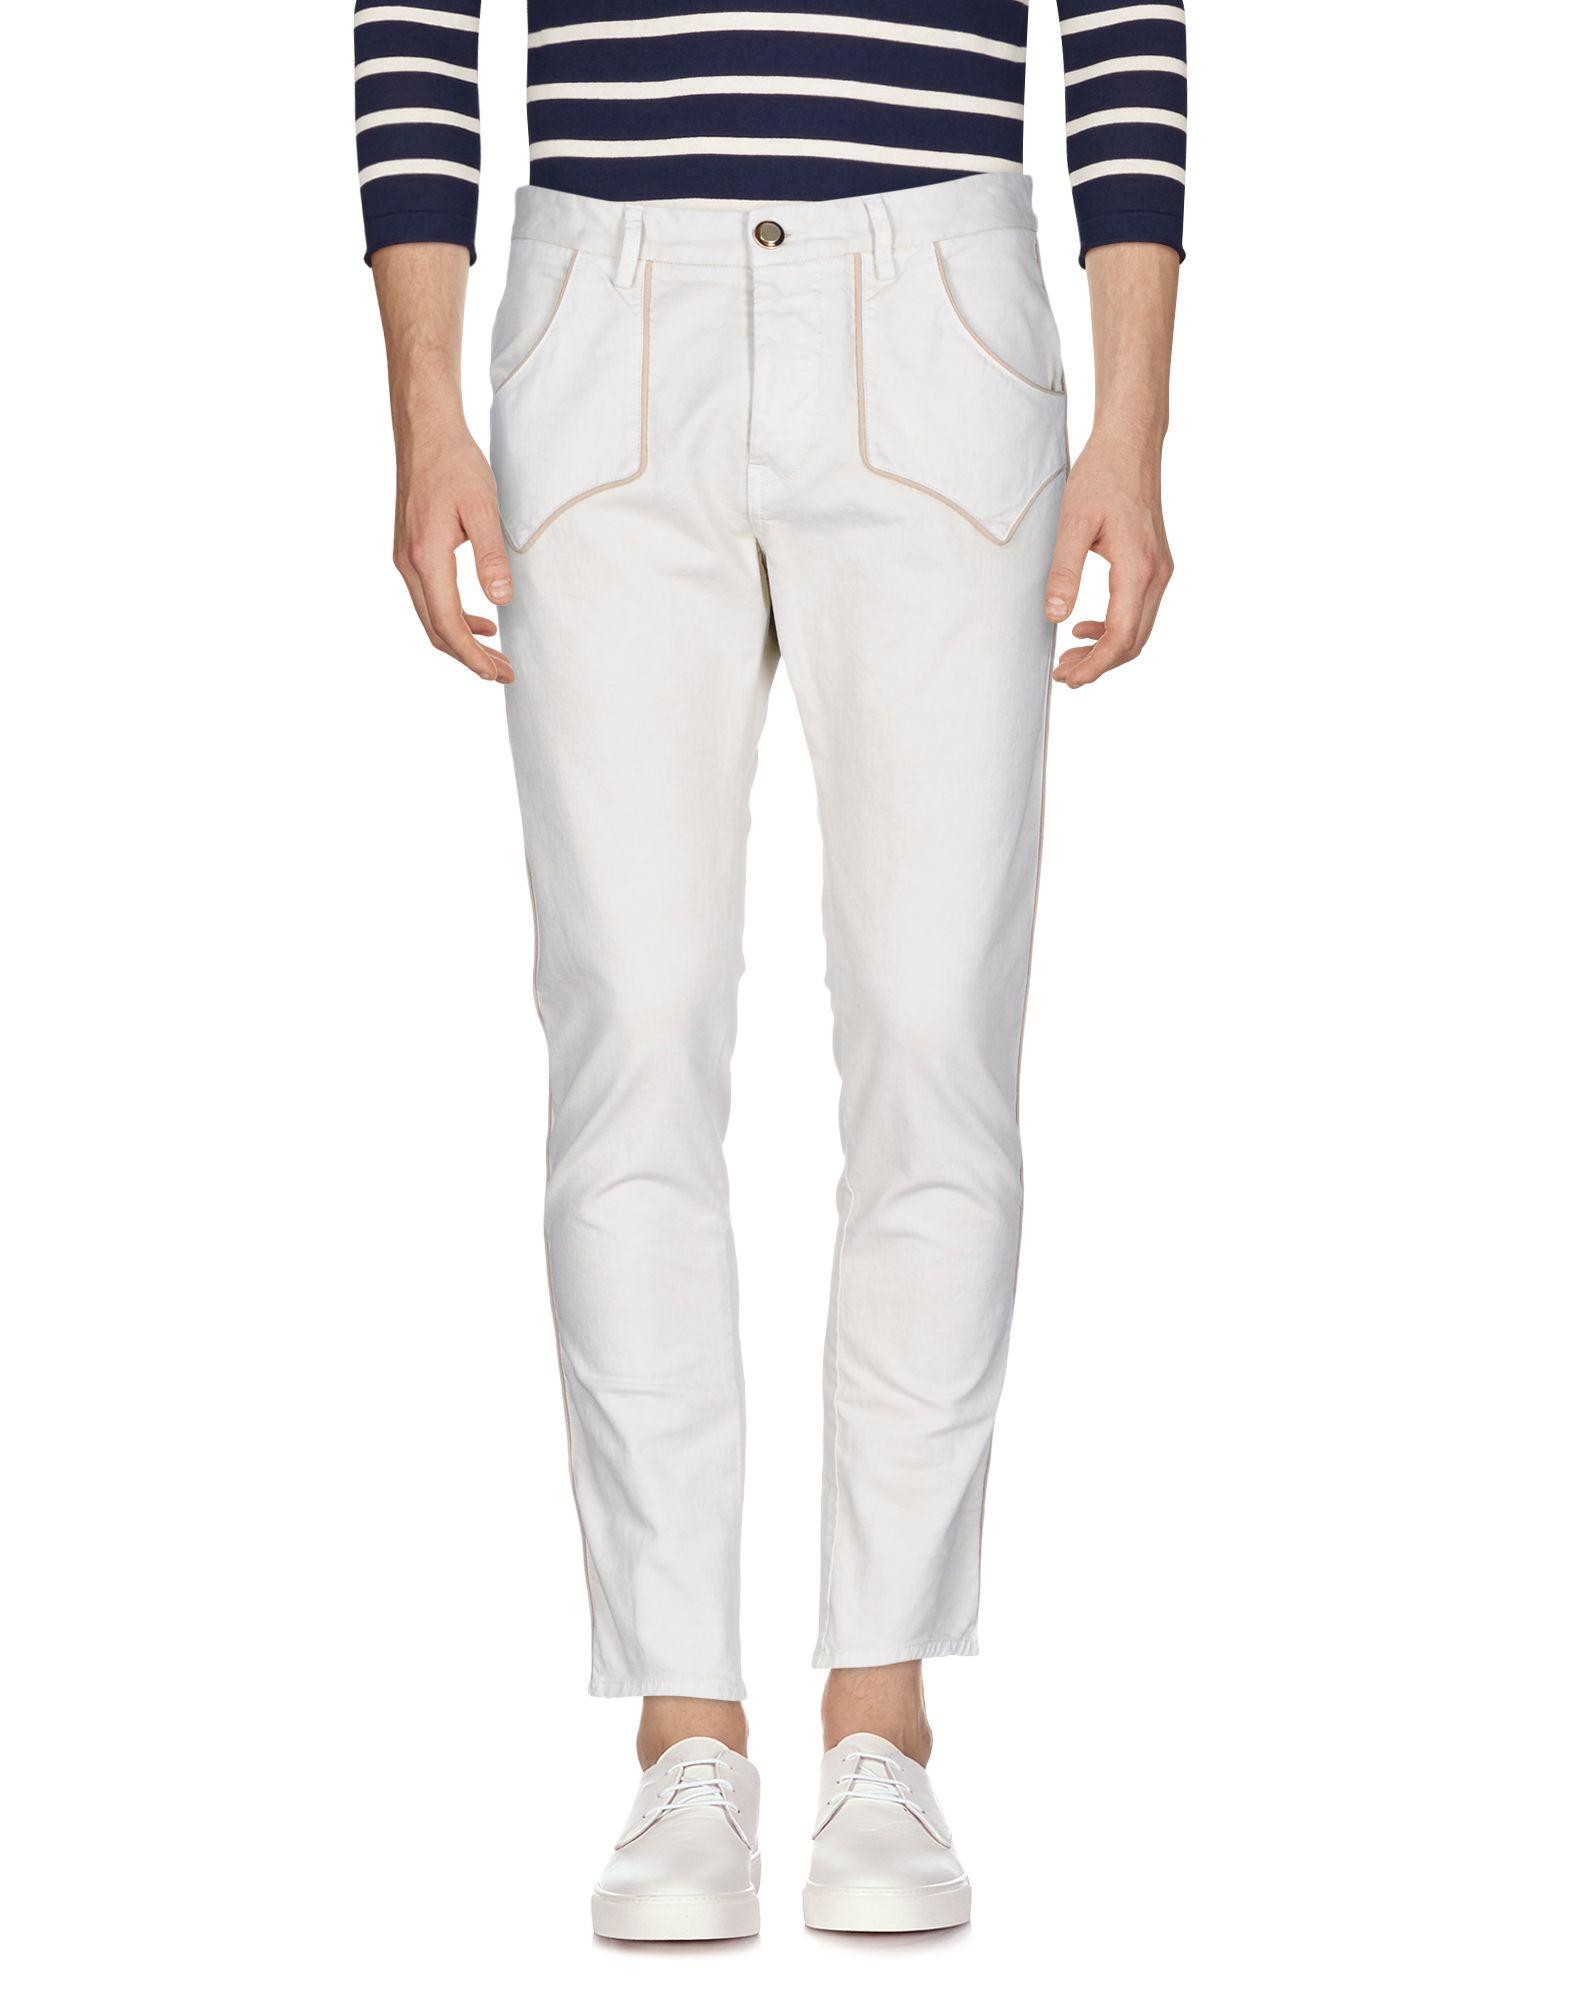 Pantaloni Jeans Etro Uomo - Acquista online su